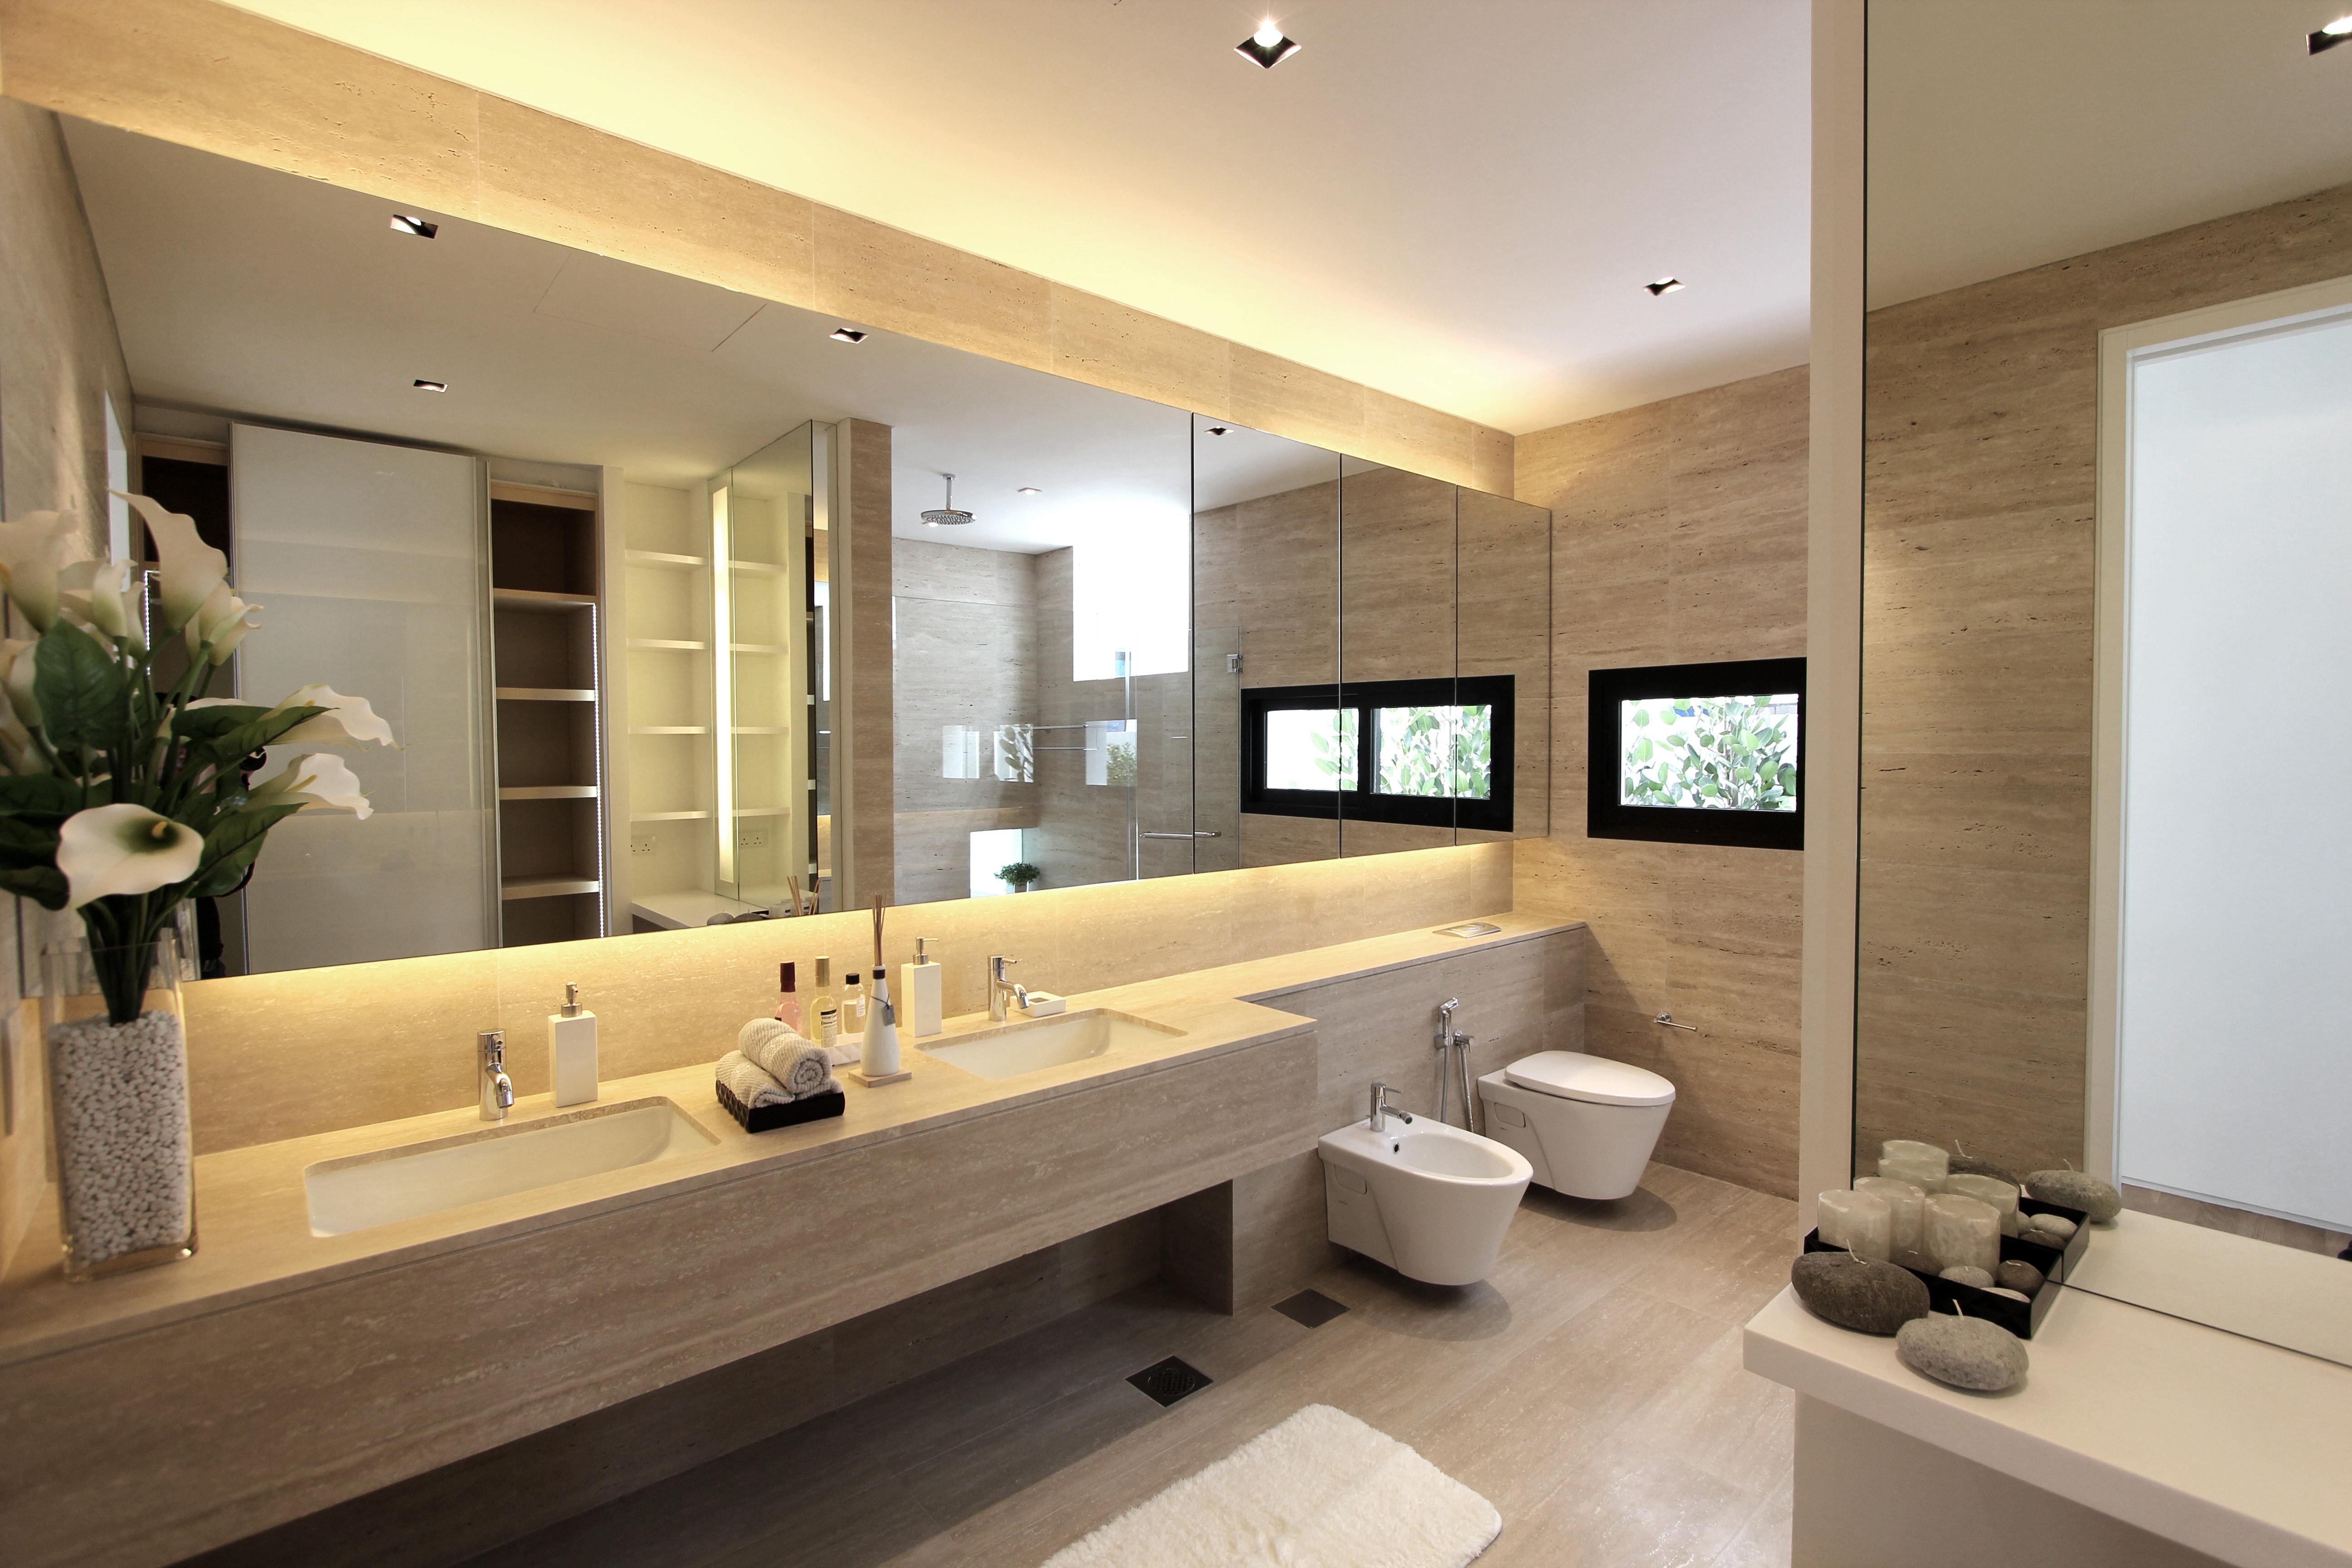 Plot 1 - Bathroom